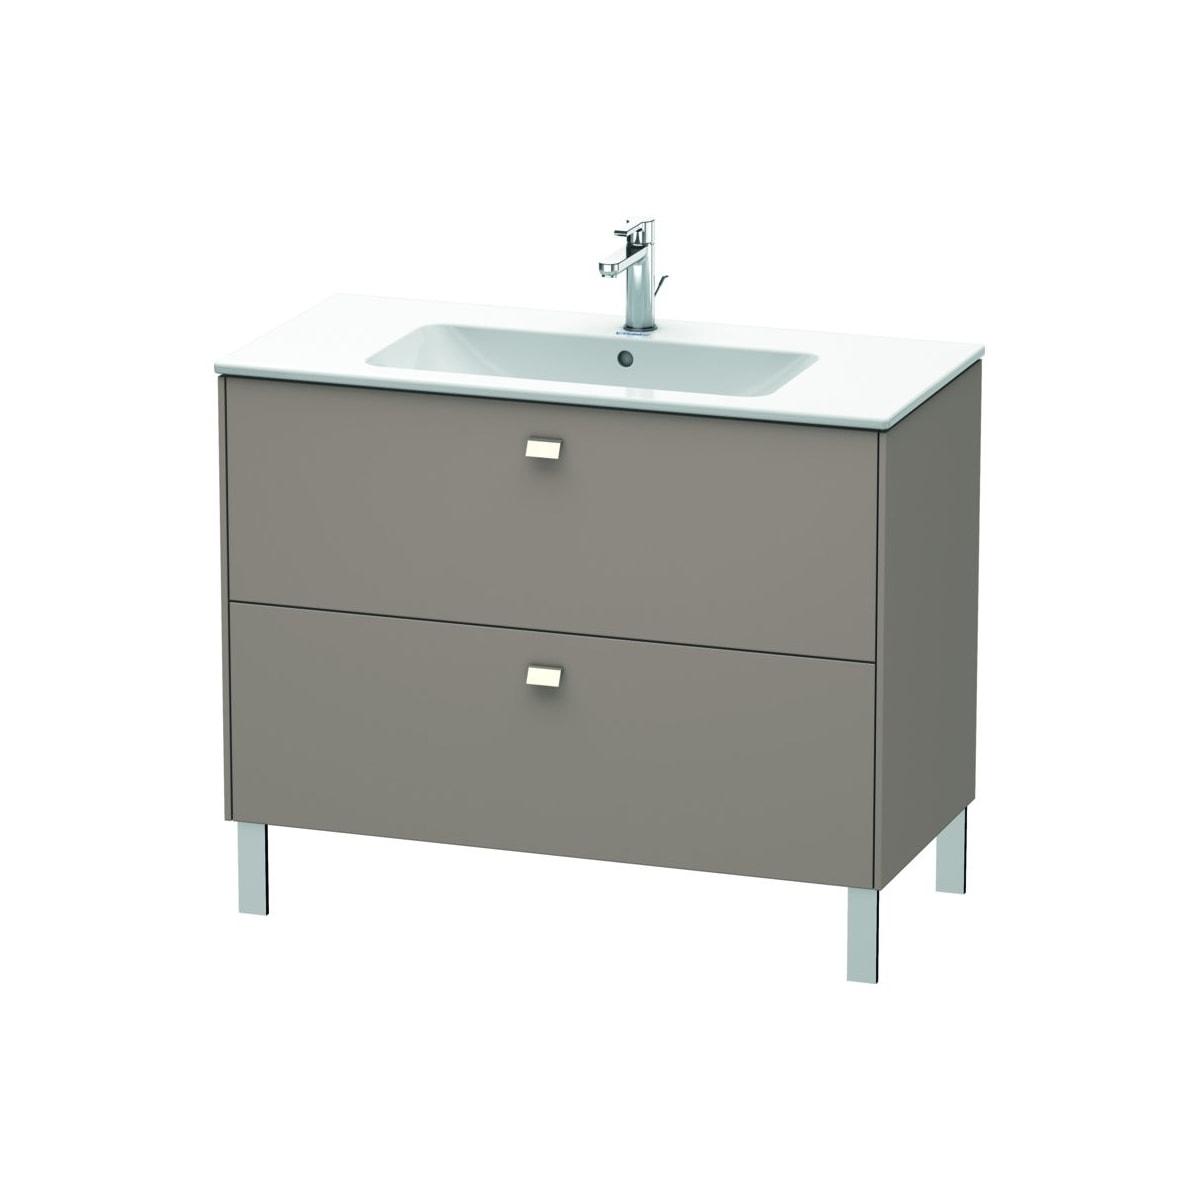 Duravit Br440301052 Chrome European Oak Brioso 40 Single Free Standing Wood Vanity Cabinet Only Less Vanity Top Faucet Com